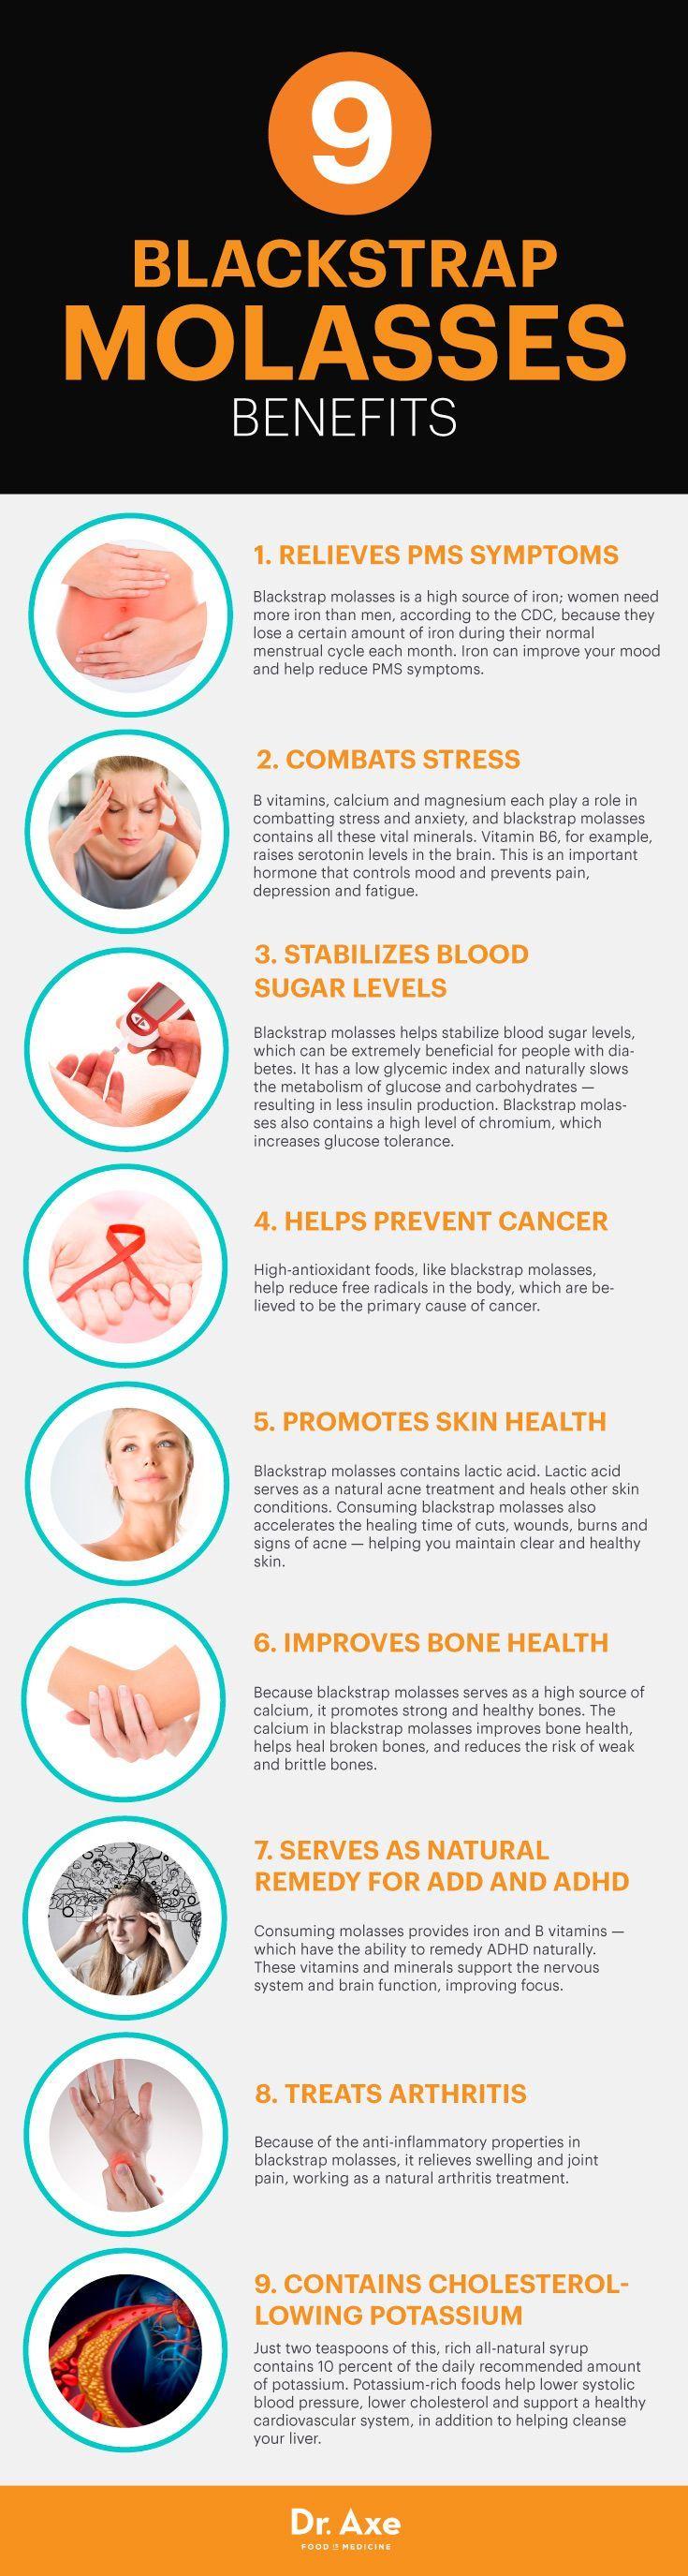 Blackstrap molasses benefits - Dr. Axe www.draxe.com #health #holistic #natural